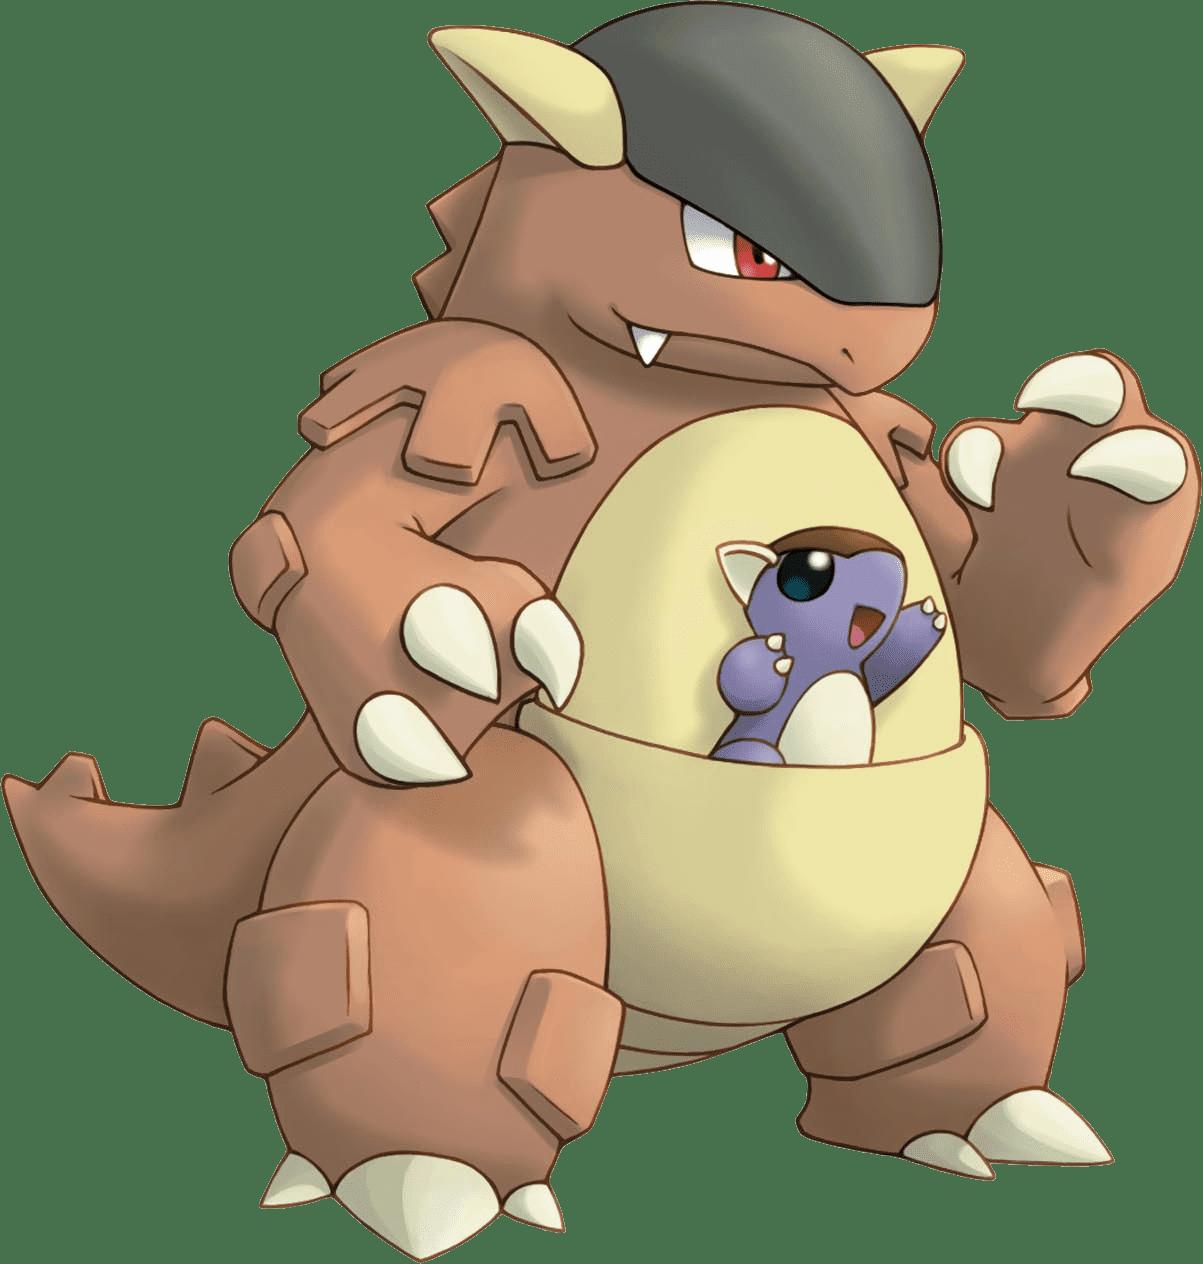 Pokemon Yang Susah Didapatkan 4